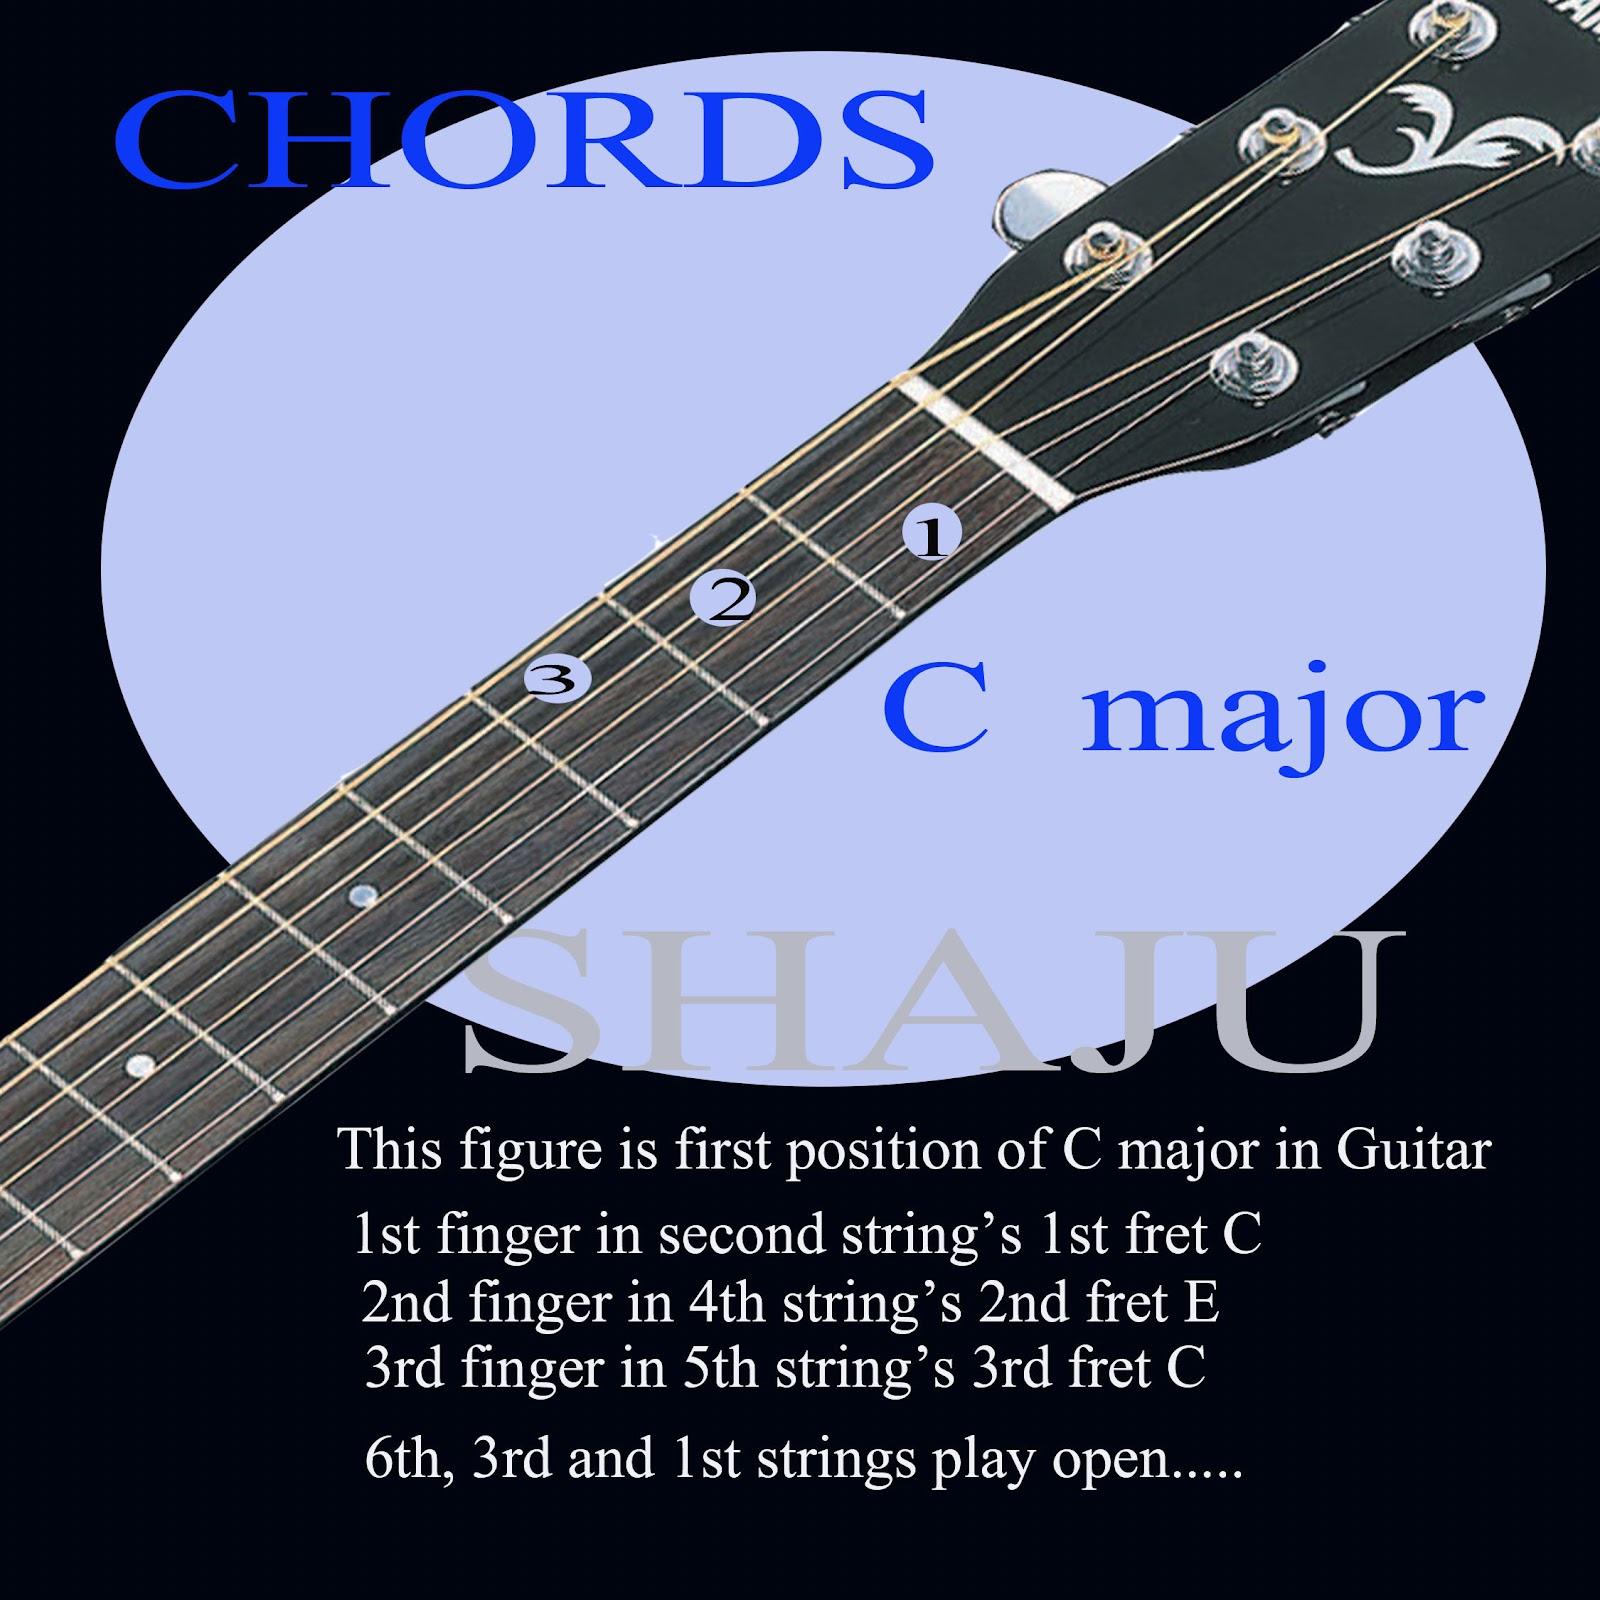 shaju 39 s guitar lessons c major. Black Bedroom Furniture Sets. Home Design Ideas